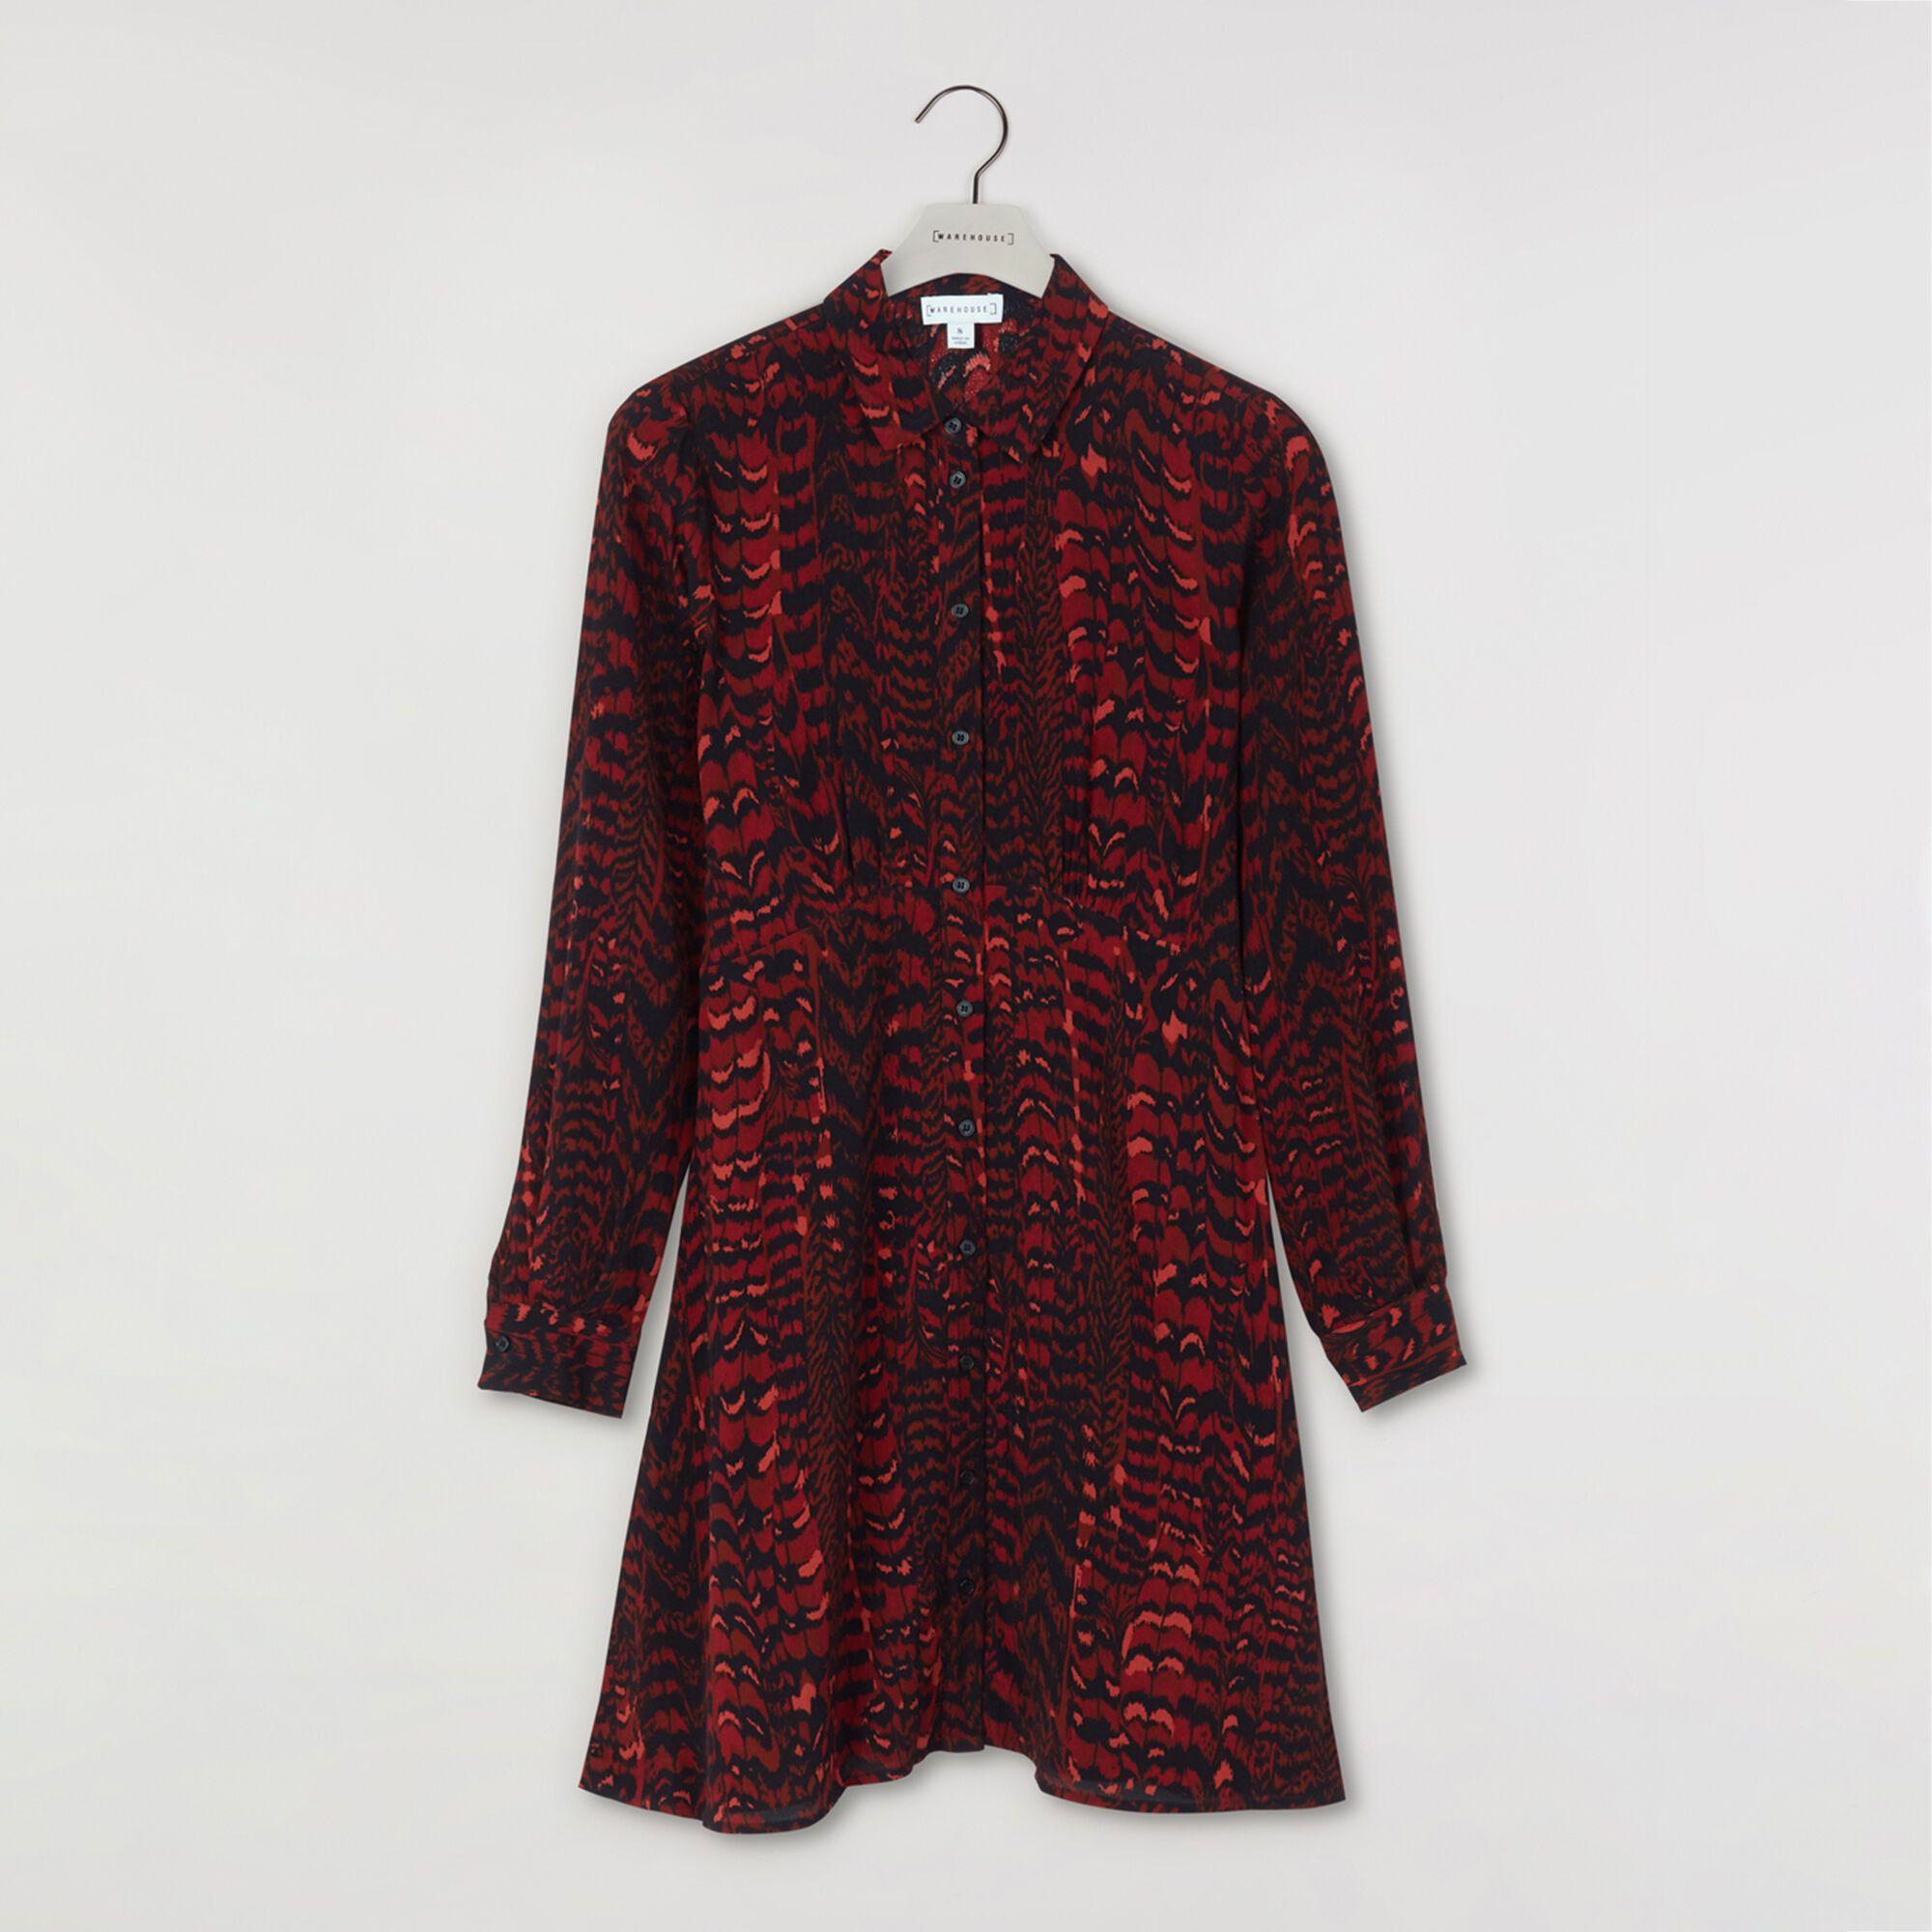 Idea By Warehouse On Trending Now Mini Shirt Dress Feathered Shirt Shirt Dress